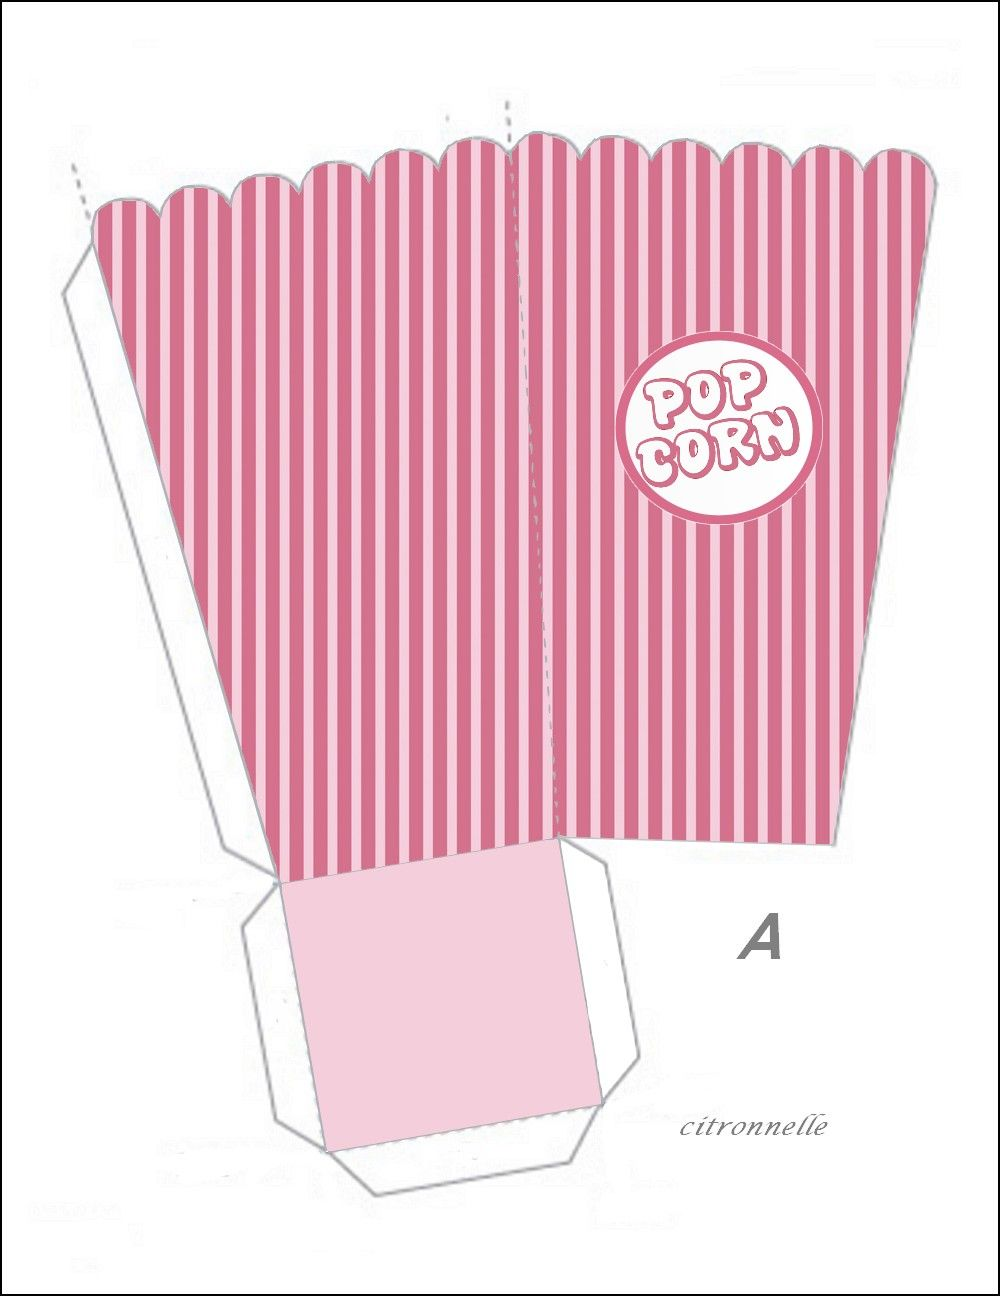 boite pop corn patron po le cuisine inox. Black Bedroom Furniture Sets. Home Design Ideas